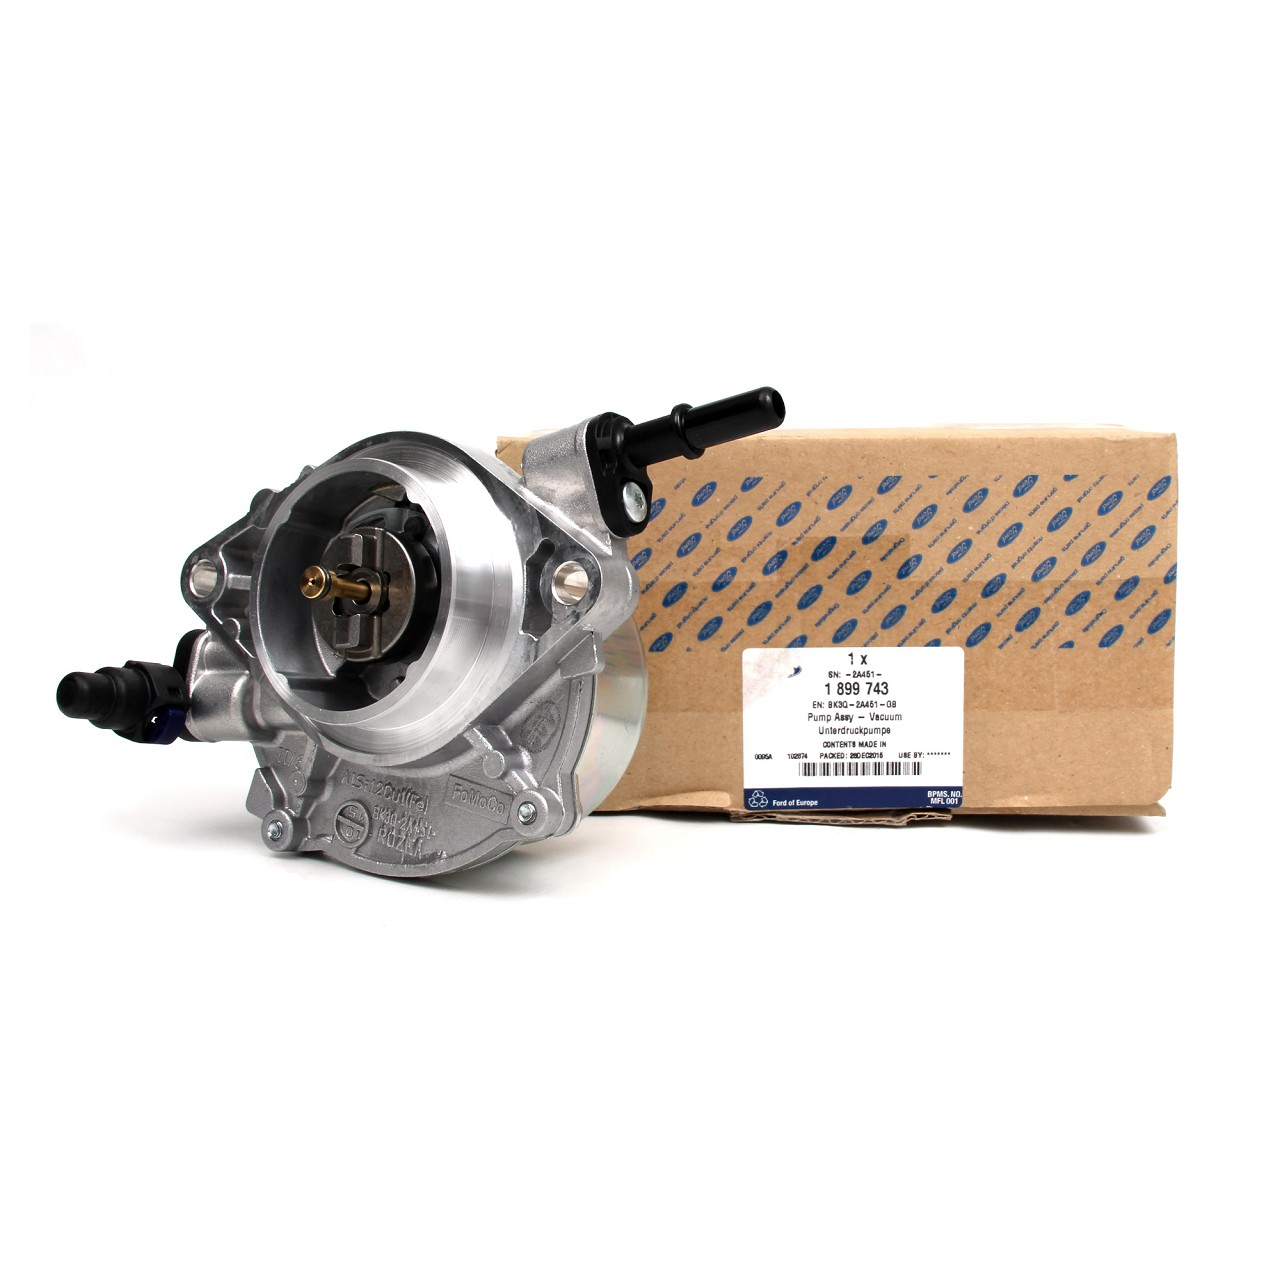 ORIGINAL Ford Unterdruckpumpe RANGER (ES ET) 2.5/3.0TDCi (TKE) 2.2TDCi 1899743